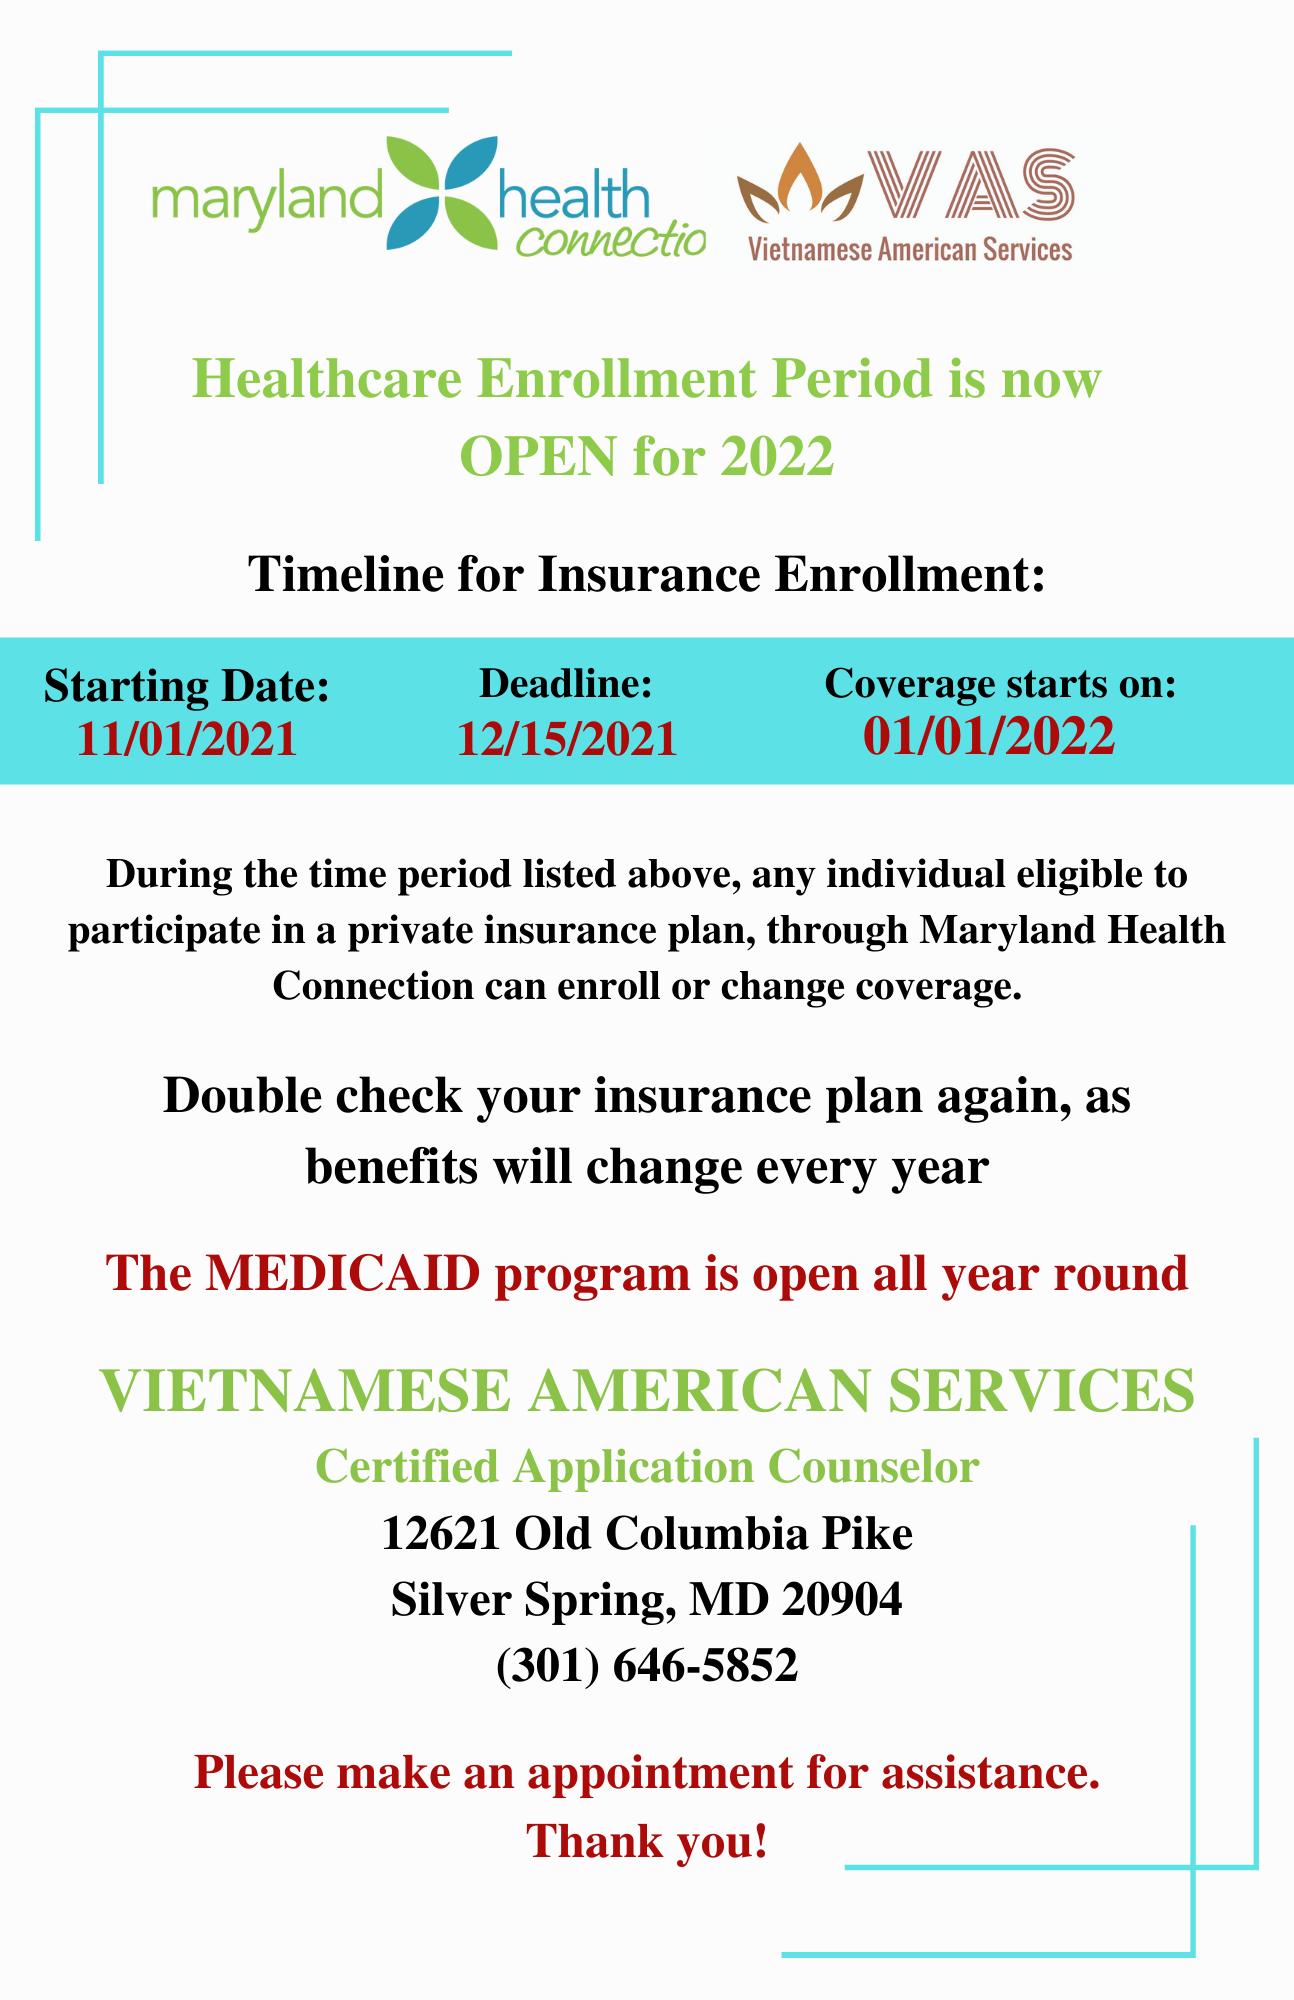 ĐÃ ĐẾN LÚC THAM GIA/GIA HẠN BẢO HIỂM Y TẾ CHO NĂM 2022 // healthcare enrollment help silver spring/dmv area at vietnamese american services